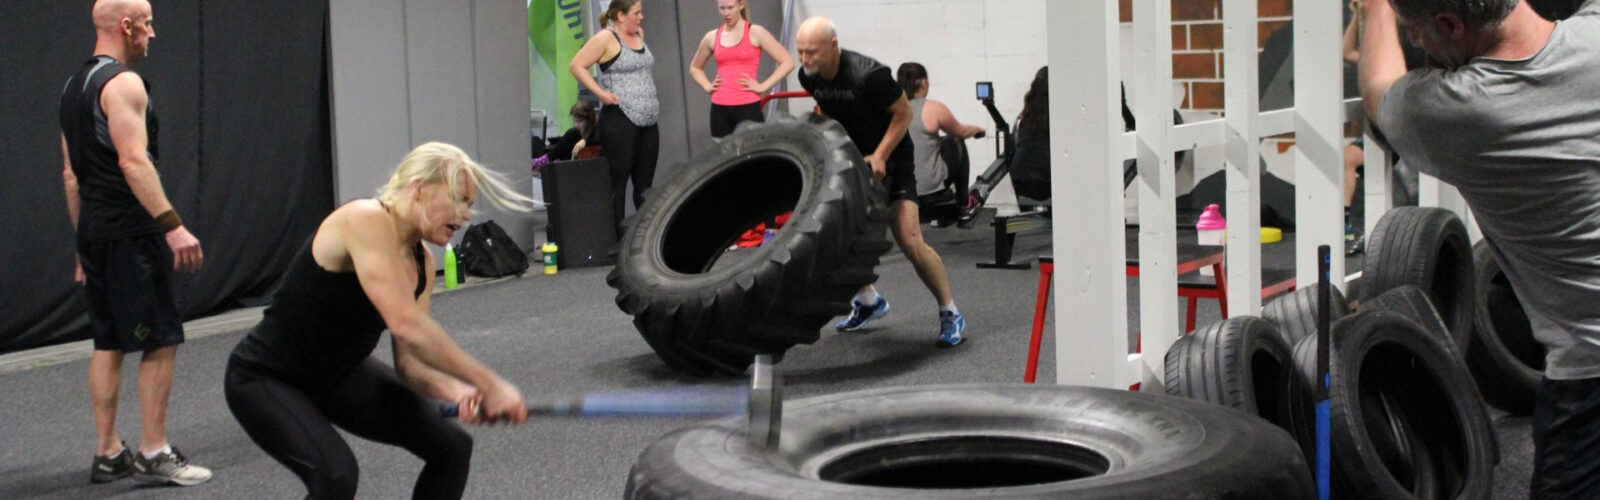 Träning i gym